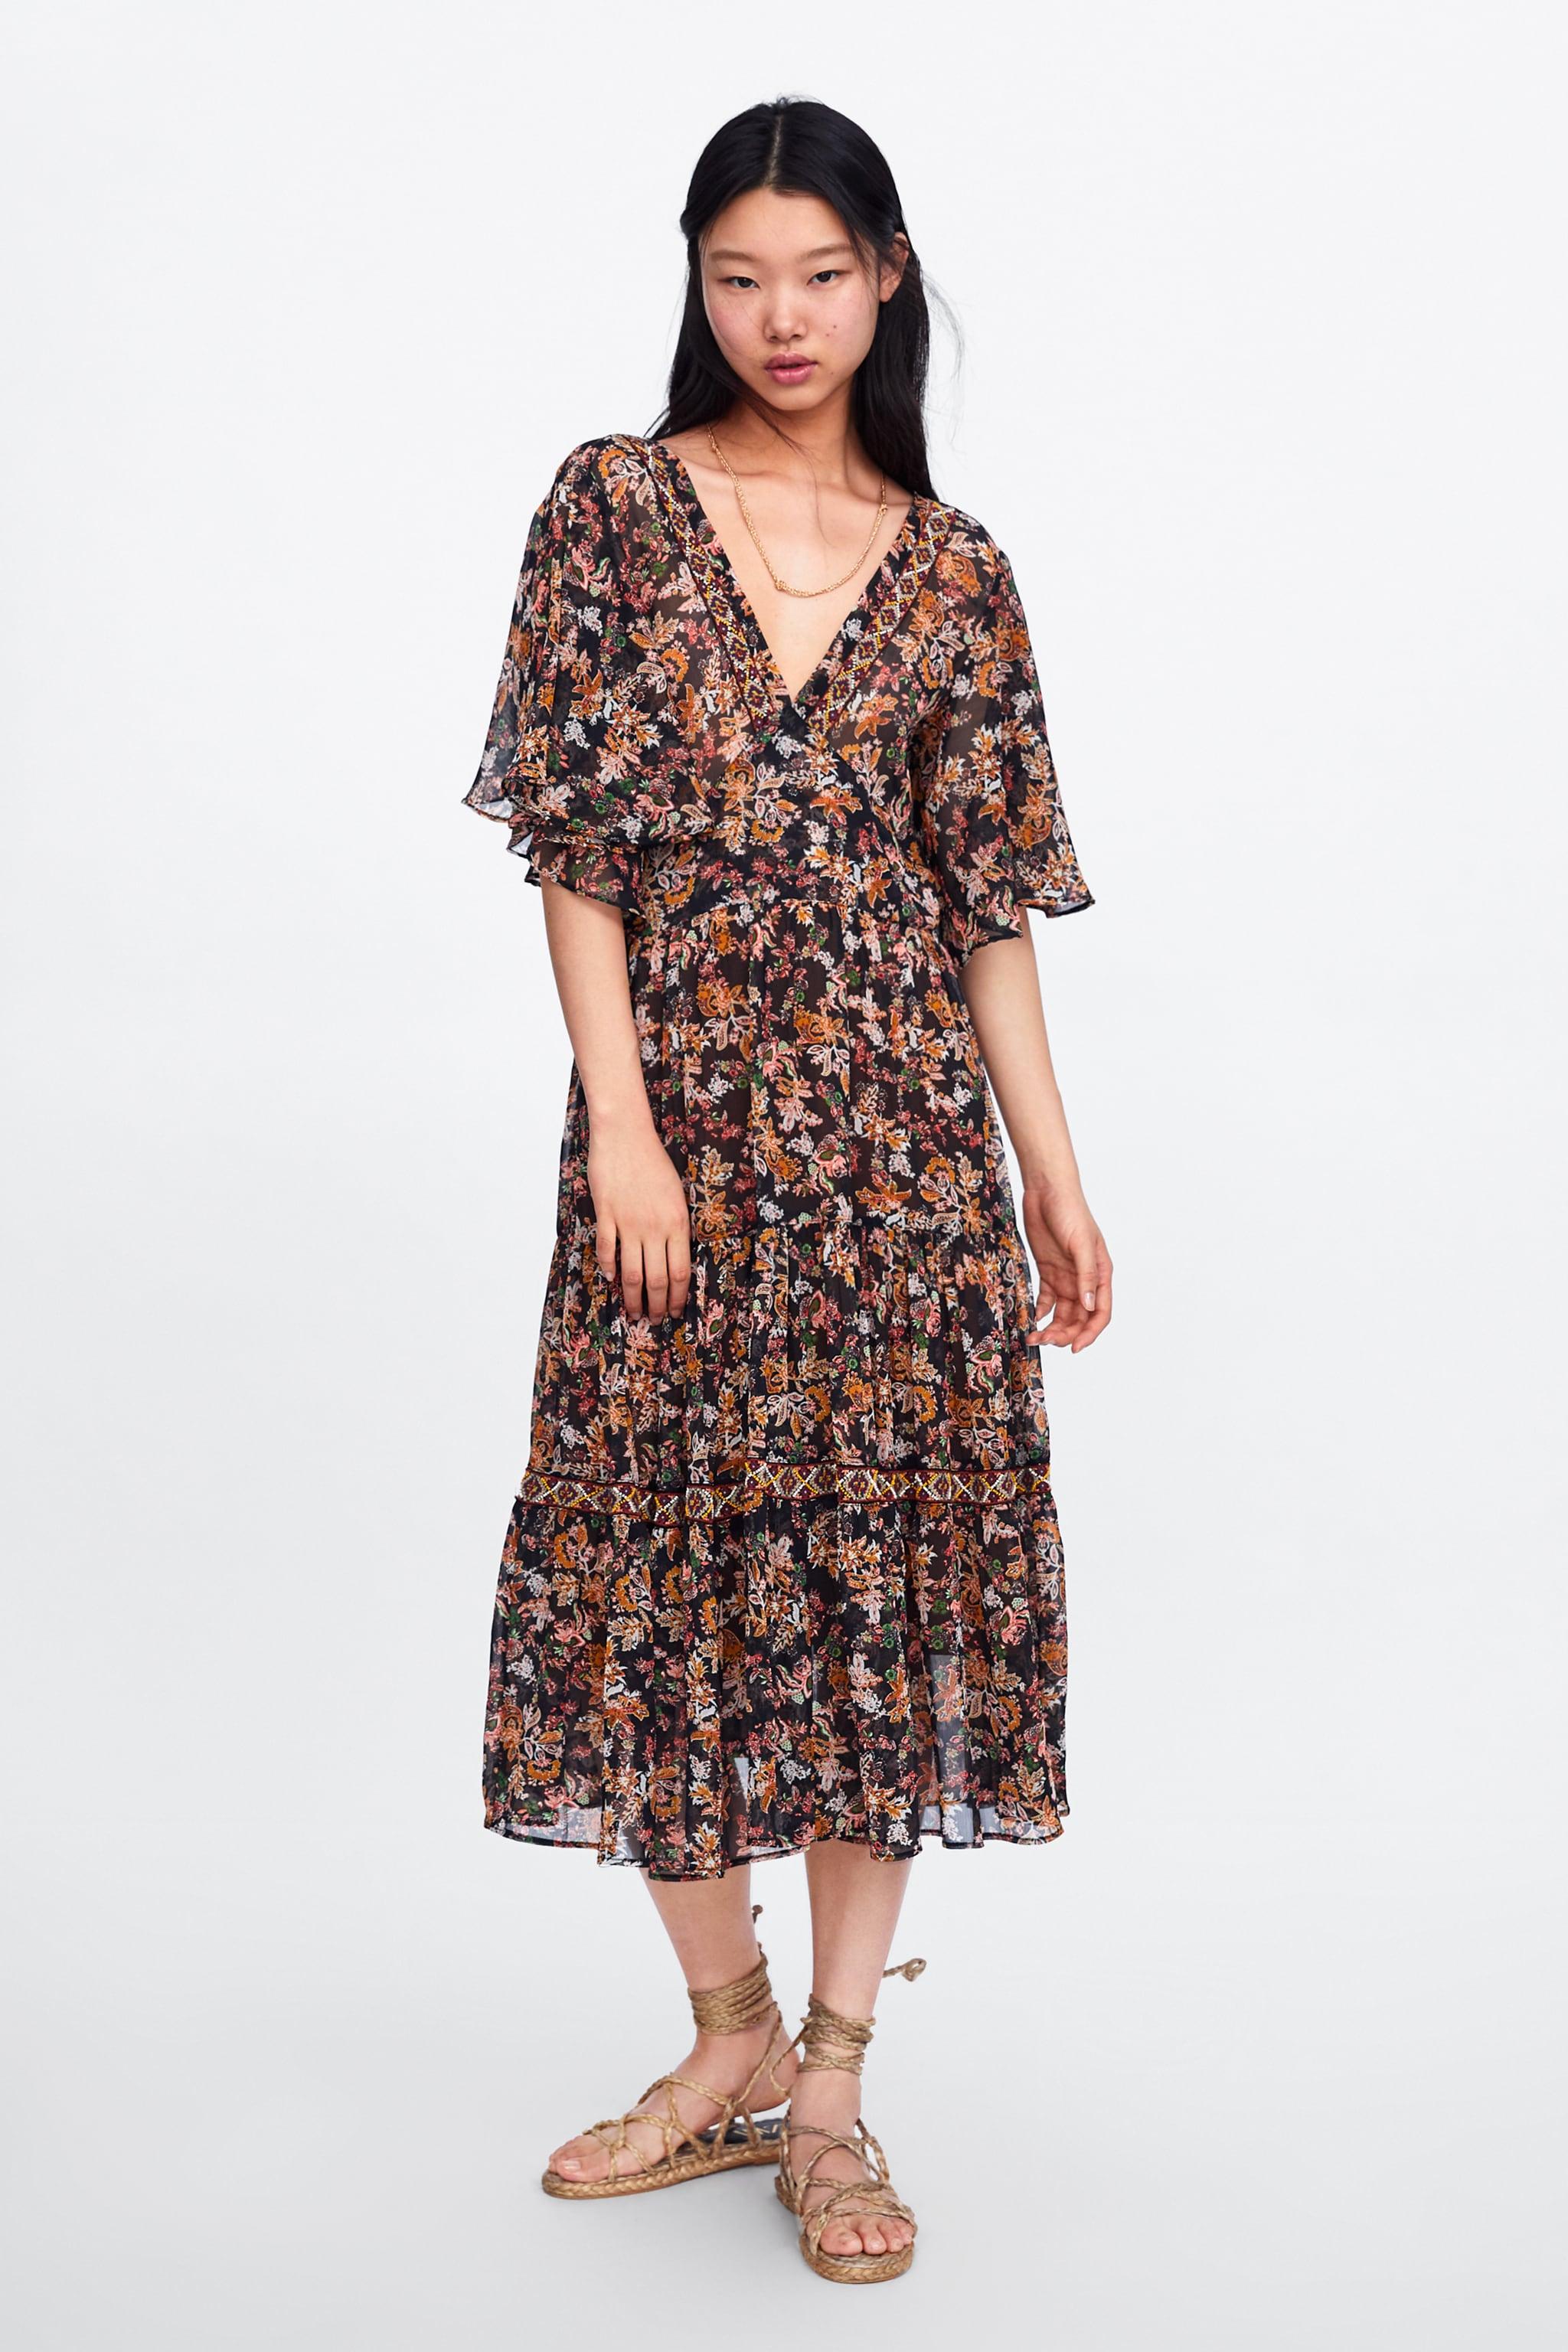 fd7334c8d Zara FLORAL PRINT DRESS